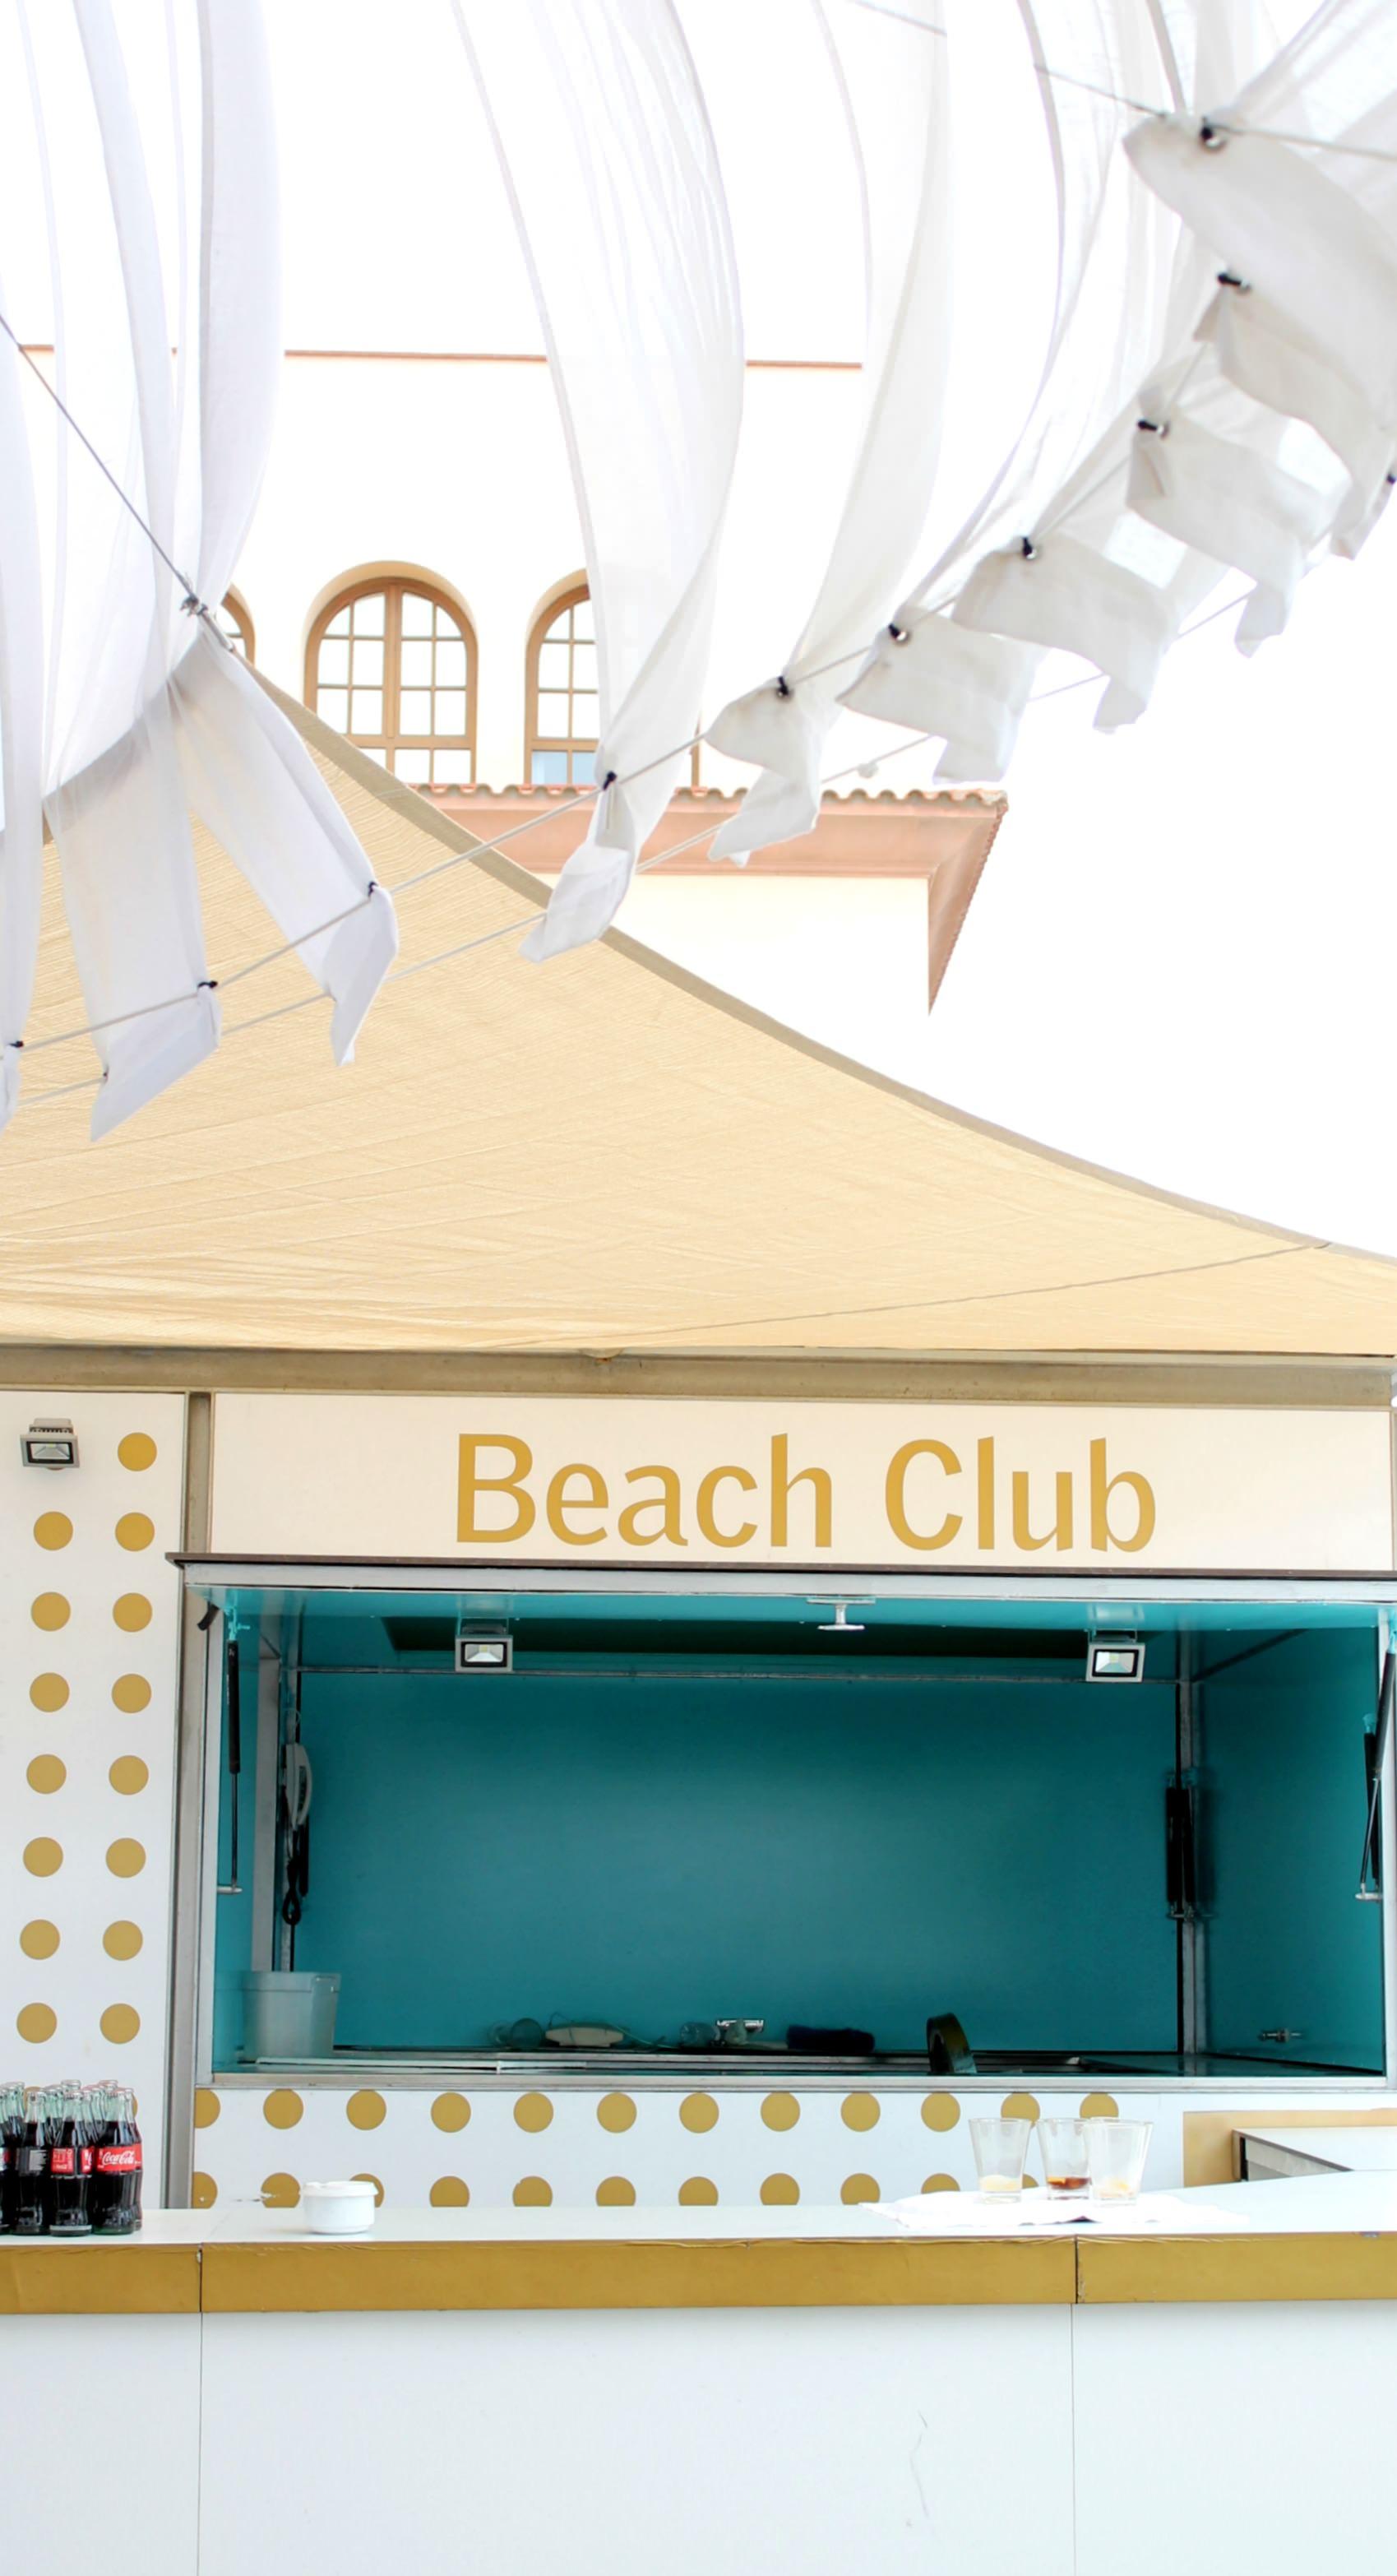 Le-Meridien-Ra-beach-club-photo-by-Little-Big-Bell